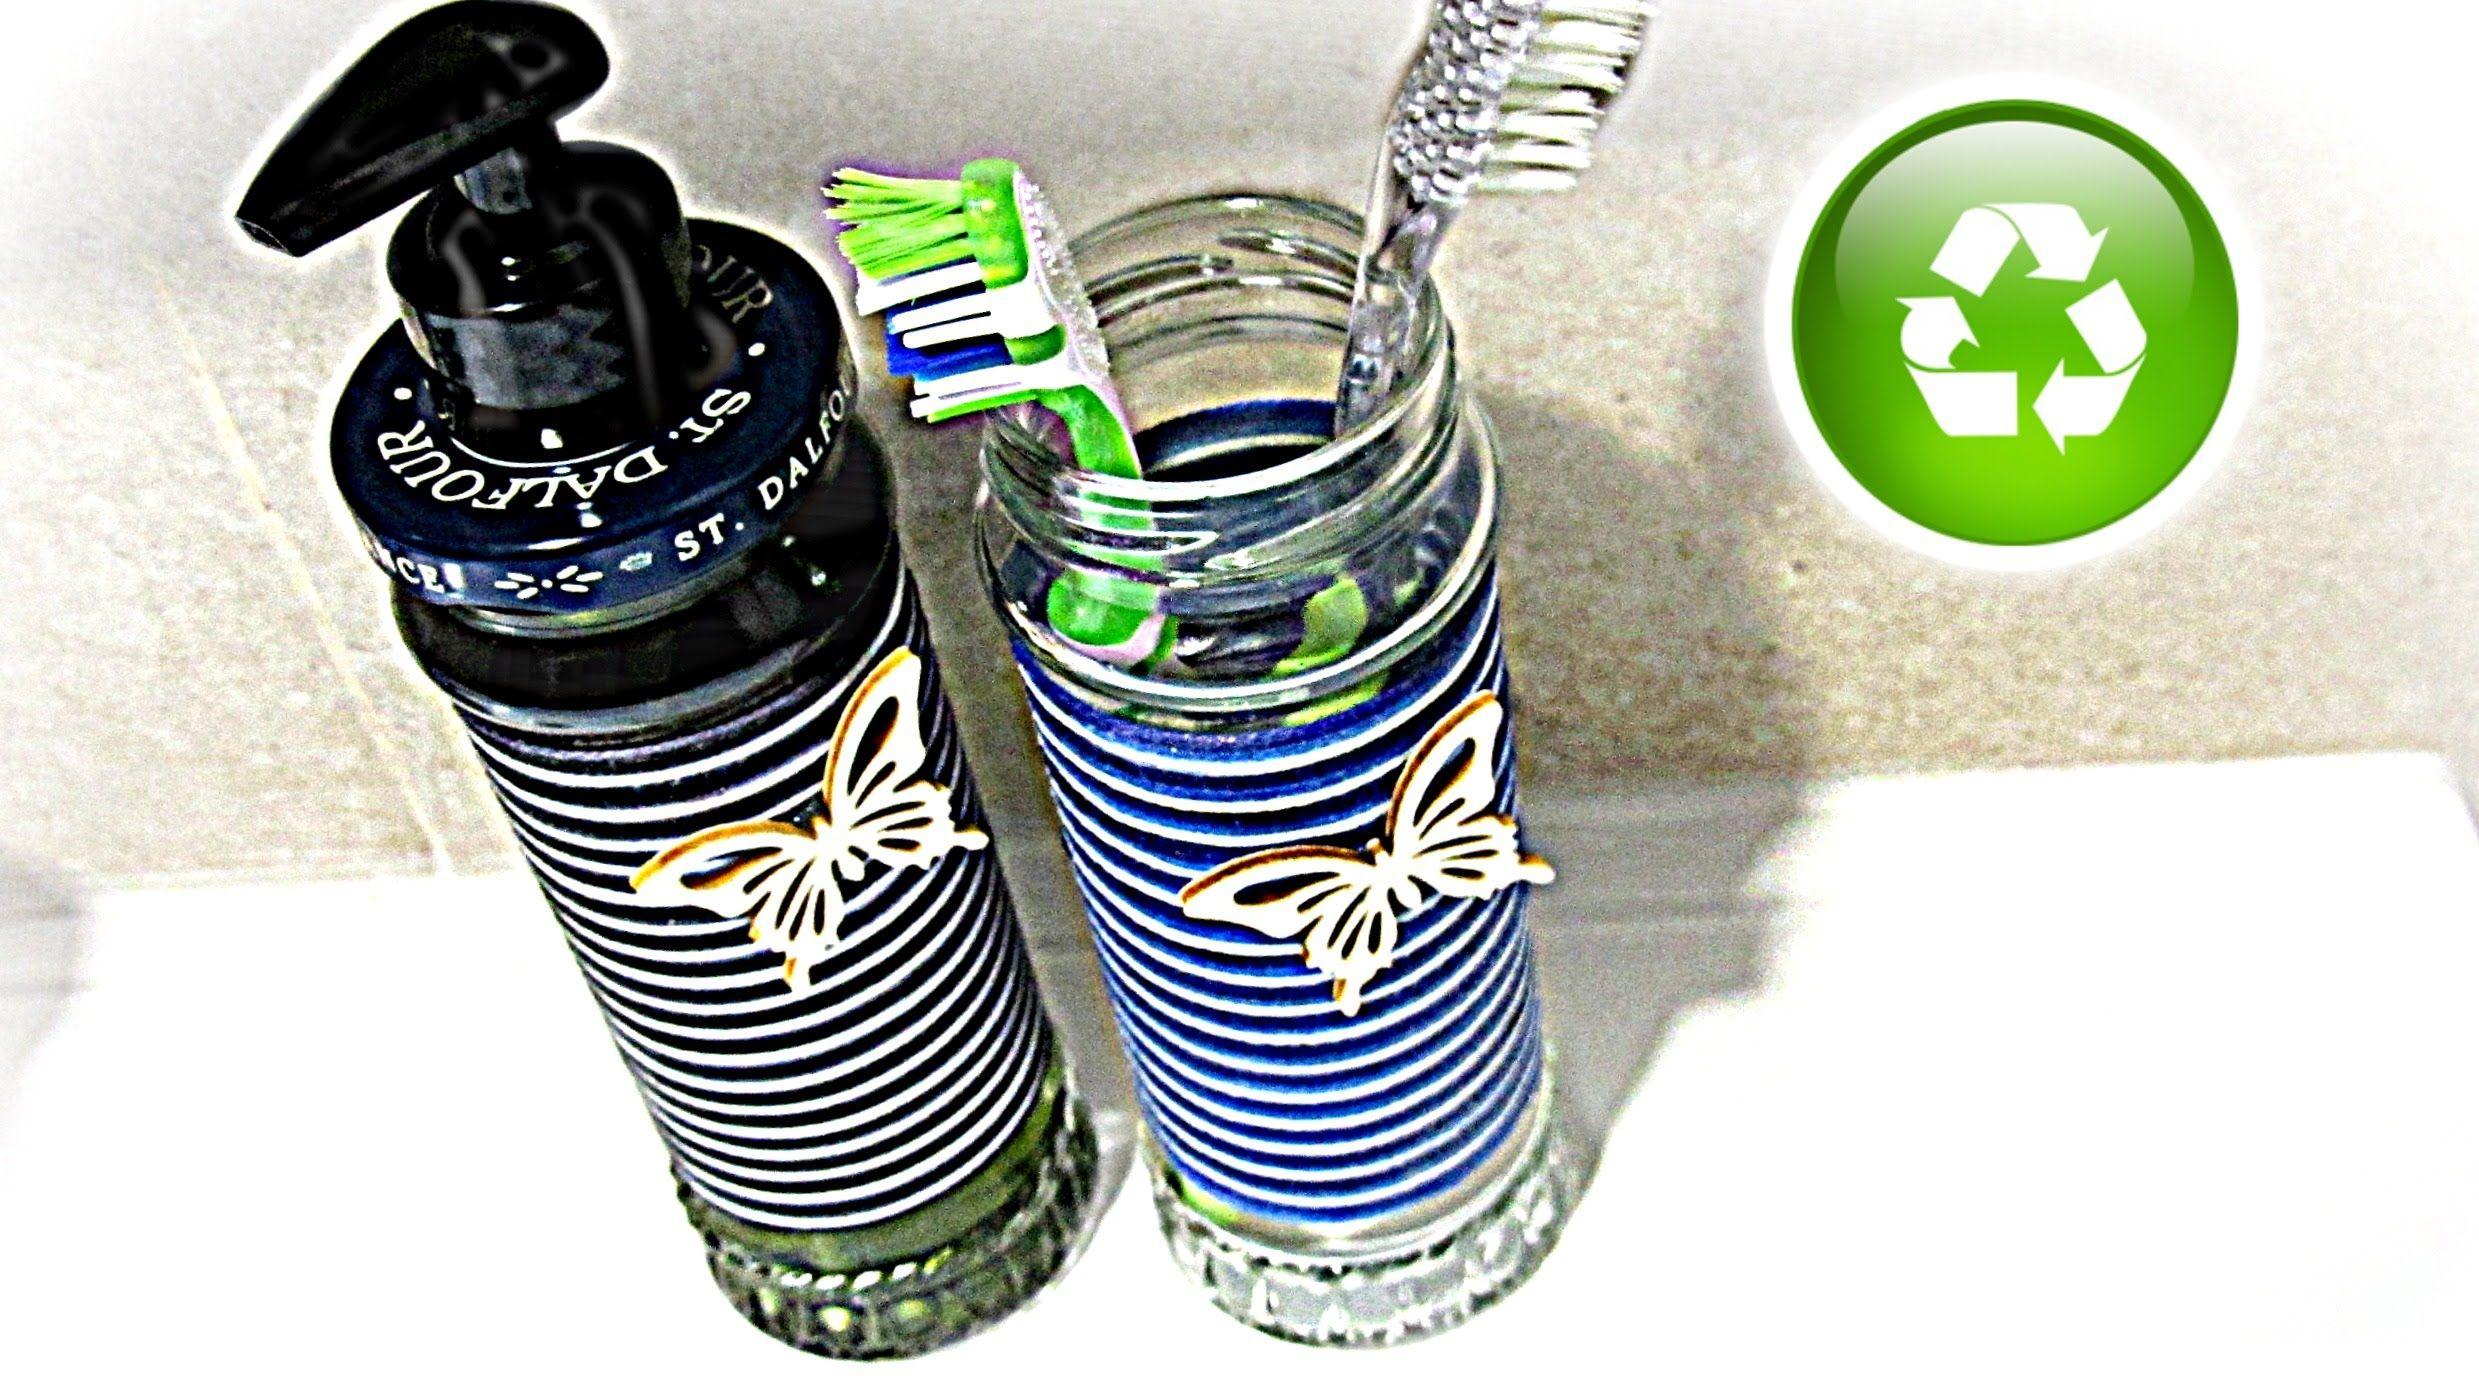 C mo hacer un dispensador de jab n reciclado how to make - Dispensador de latas ...